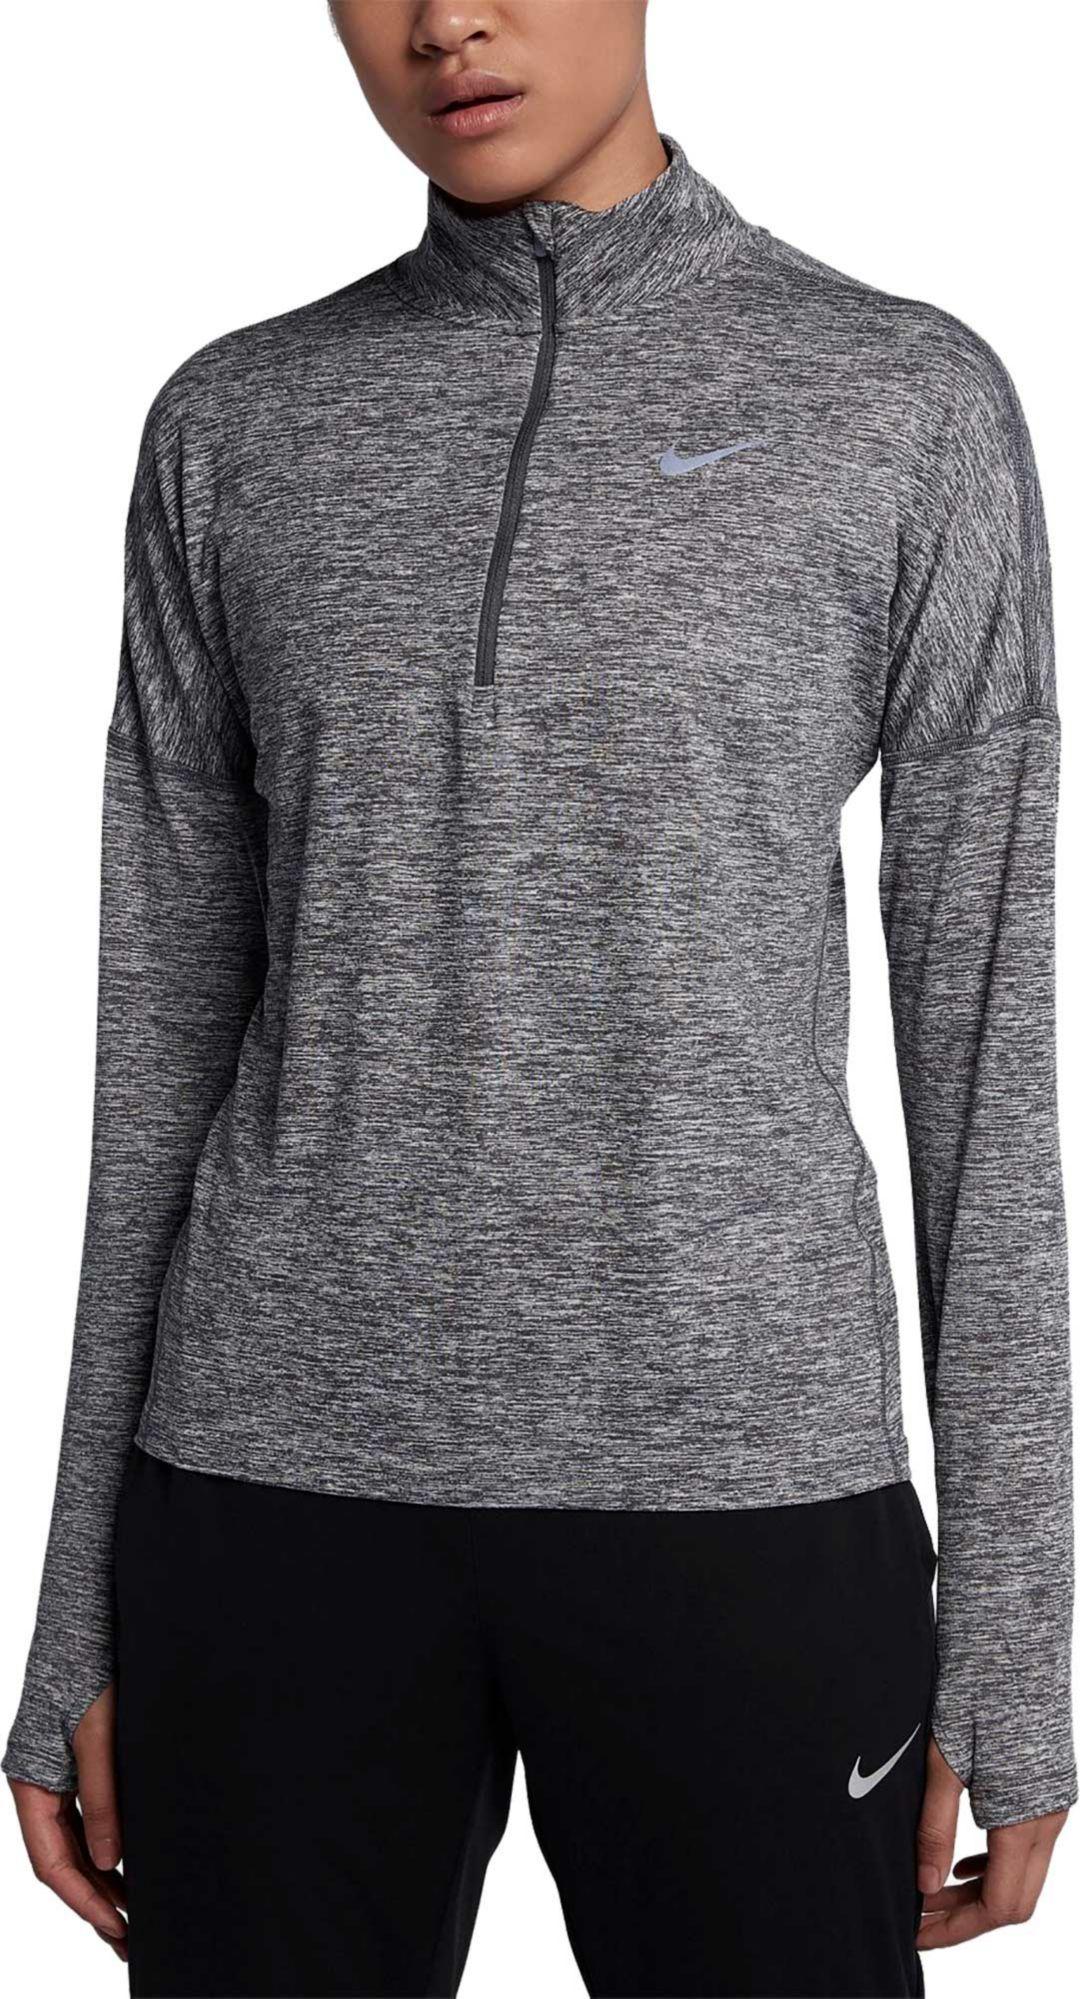 861244f615732 Nike Women's Dry Element Half Zip Long Sleeve Running Shirt | DICK'S ...